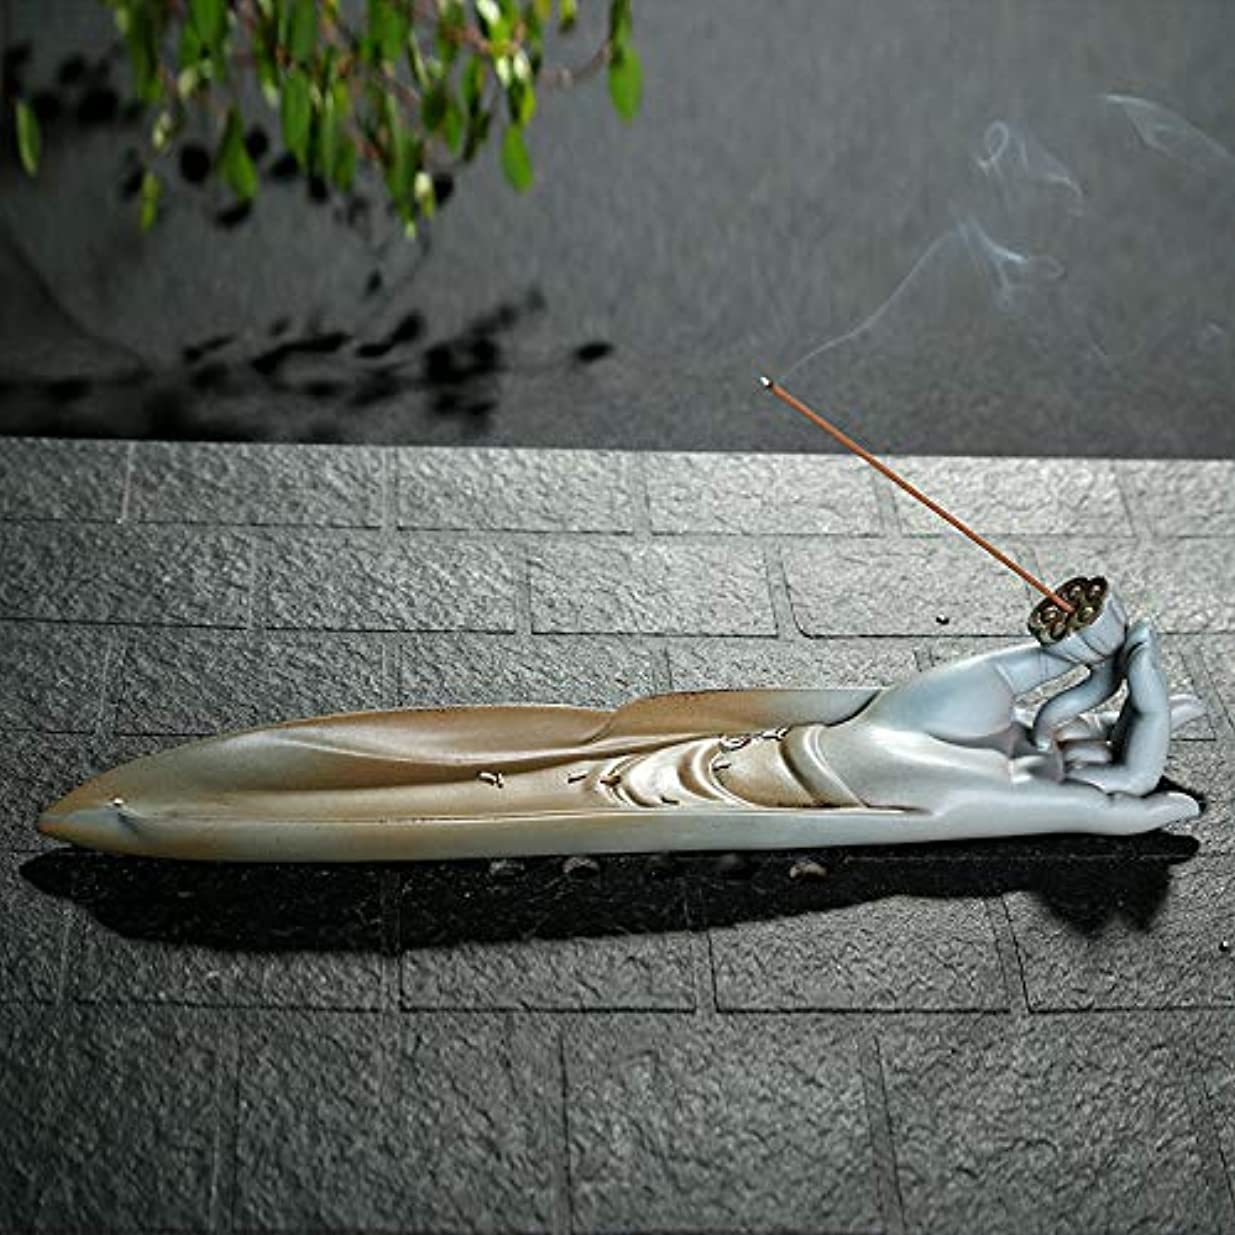 PHILOGOD 陶器線香 香立て 手作りベルガモットモデリング香炉 香皿 お香 ホルダー